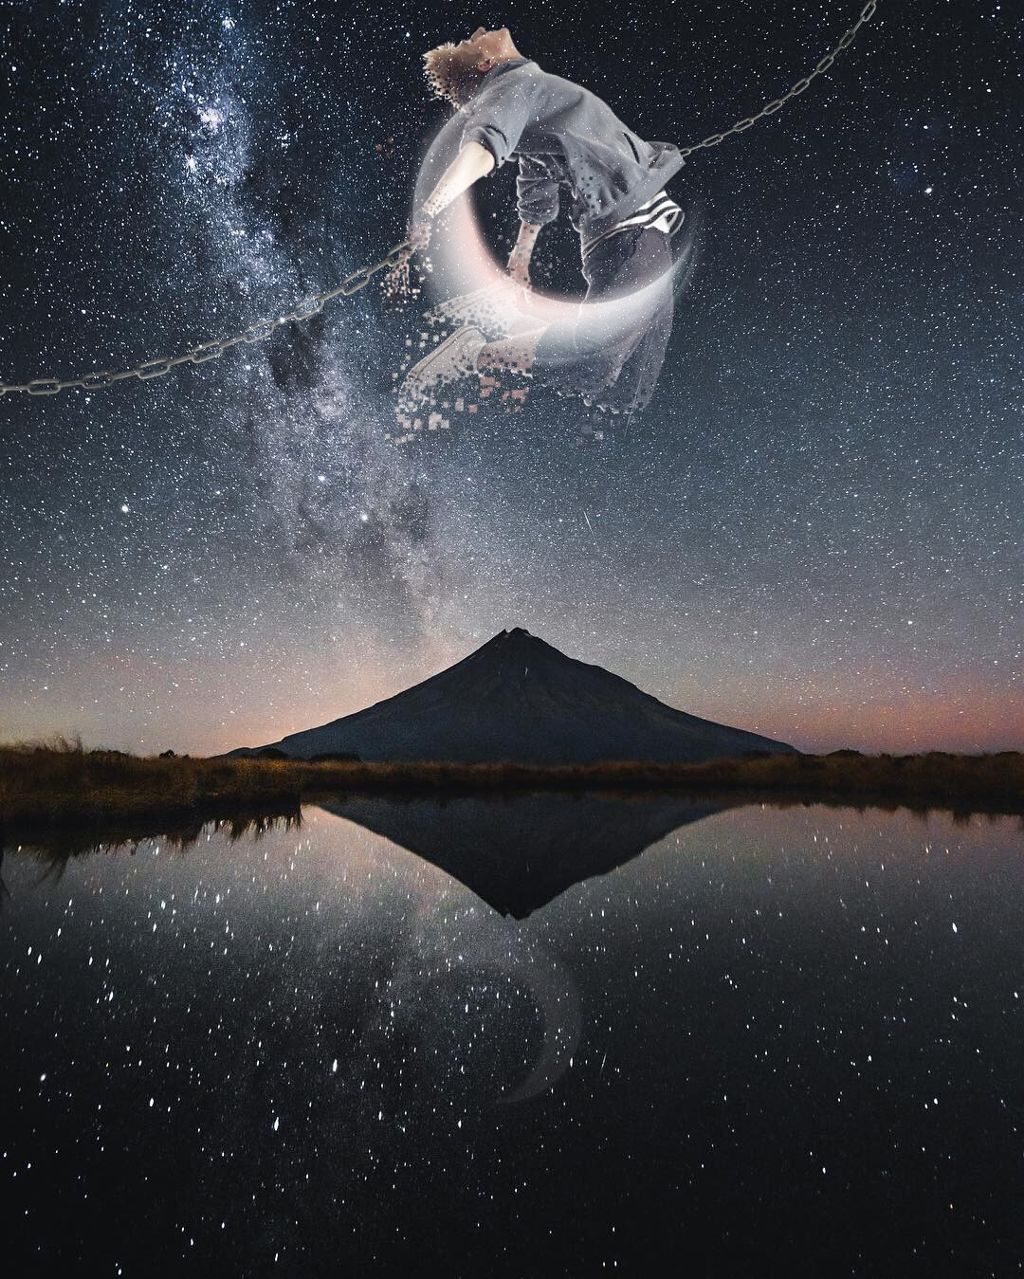 #freetoedit #interesting #art #nature #night #japan #photography #sky #people #editedwithpicsart #madewithpicsart @picsart @picsartchina @freetoedit #flyinhigh #moon #remixit #vsco